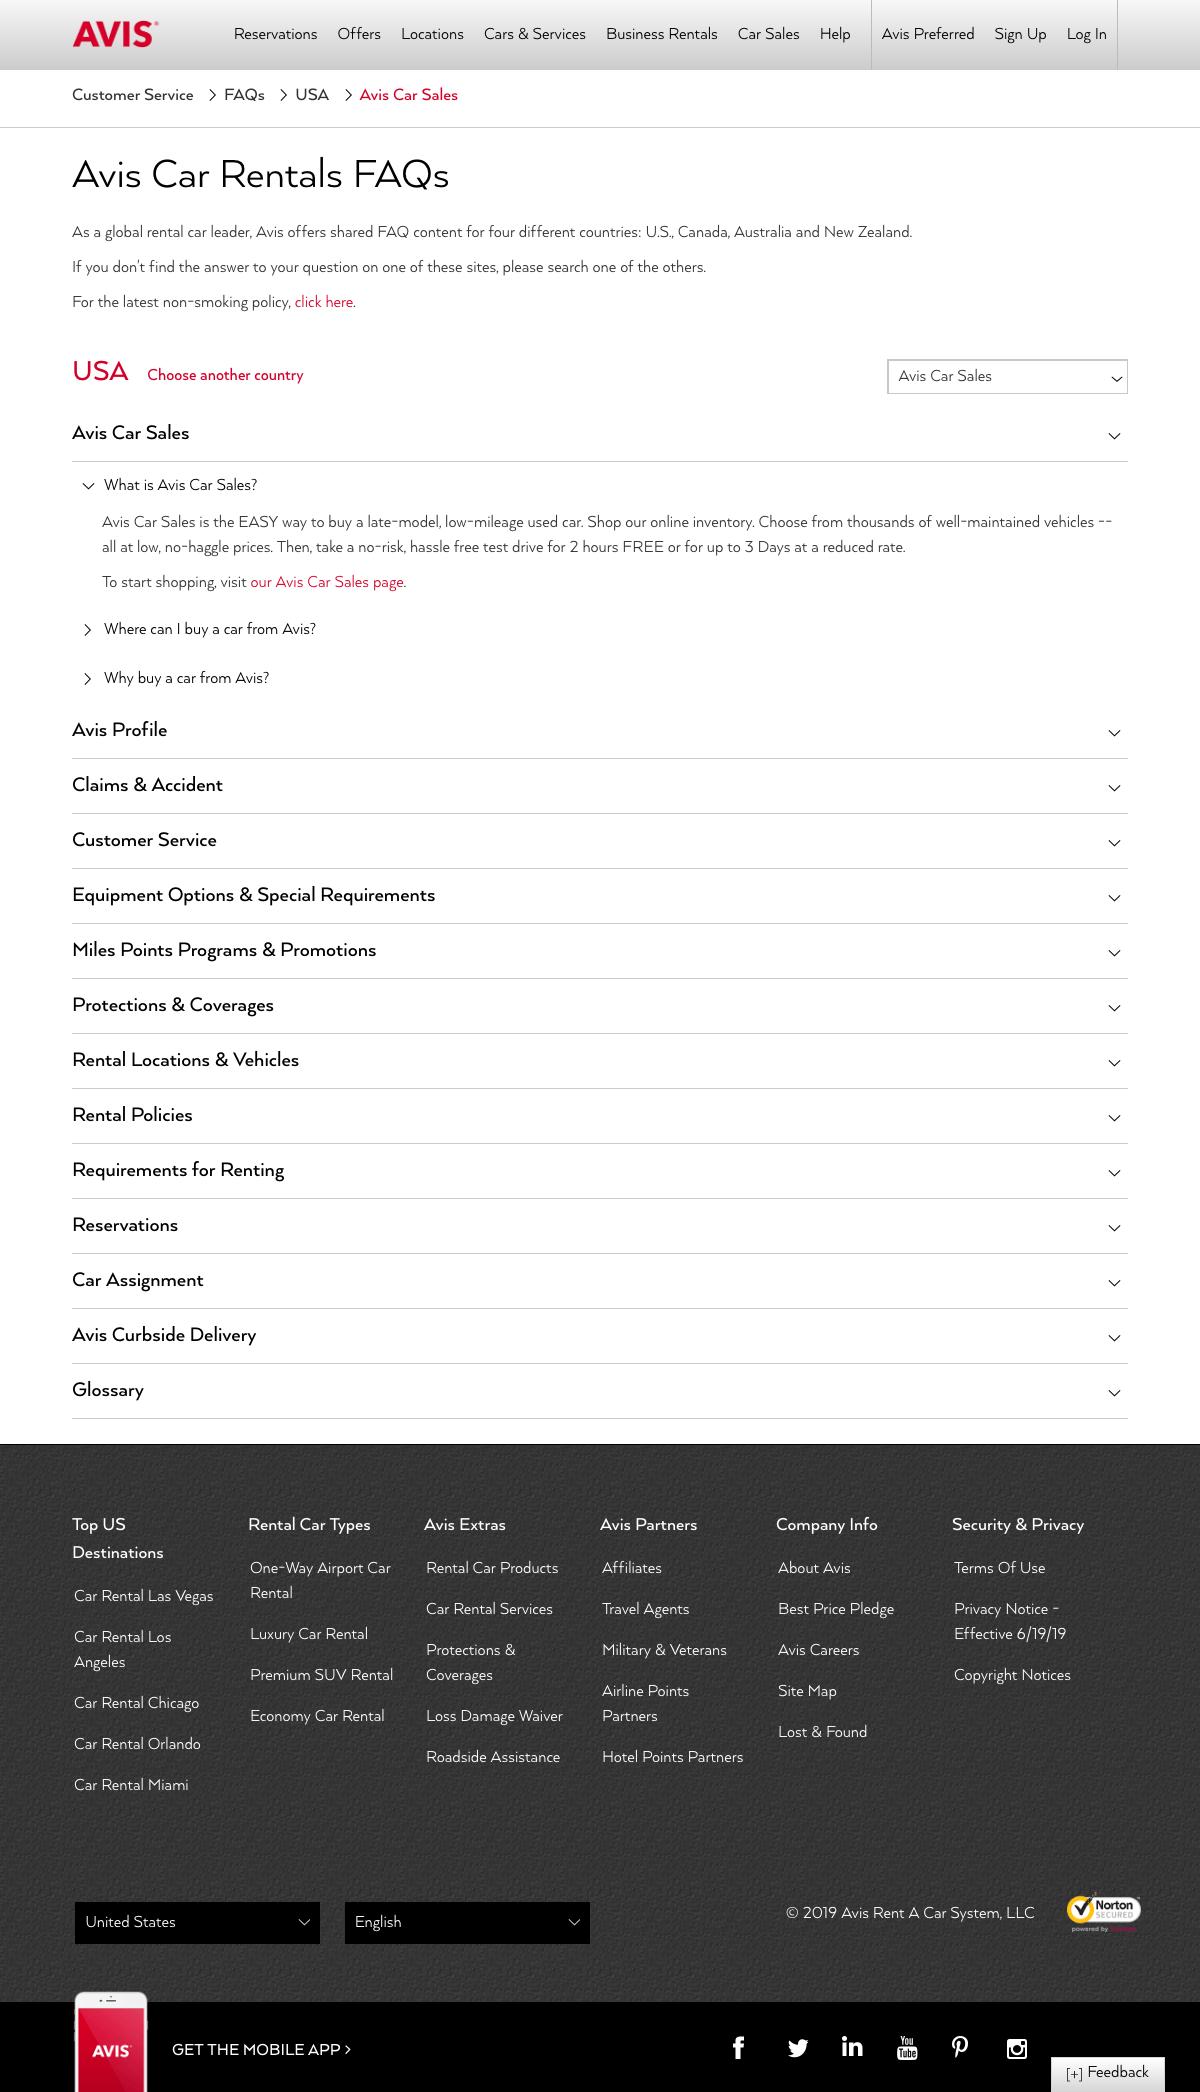 FAQs page - avis